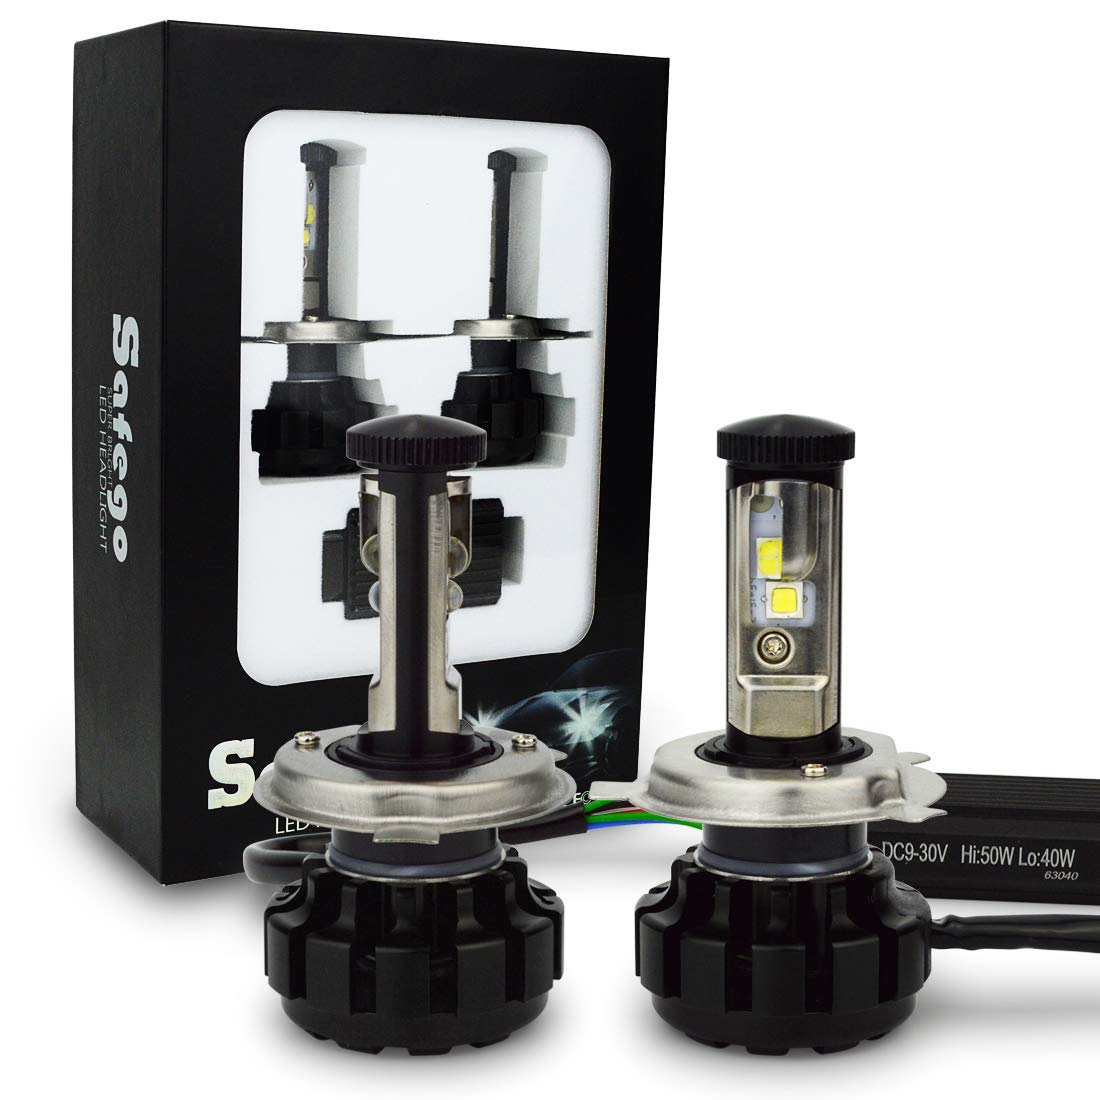 Safego H4 High Low Faro Bulbi Auto LED Luci 80W 8000LM Super Luminosa Lampada con Cree Chip, Kit LED 6000K Bianco 12V CC Conversion Kit Accessore NA